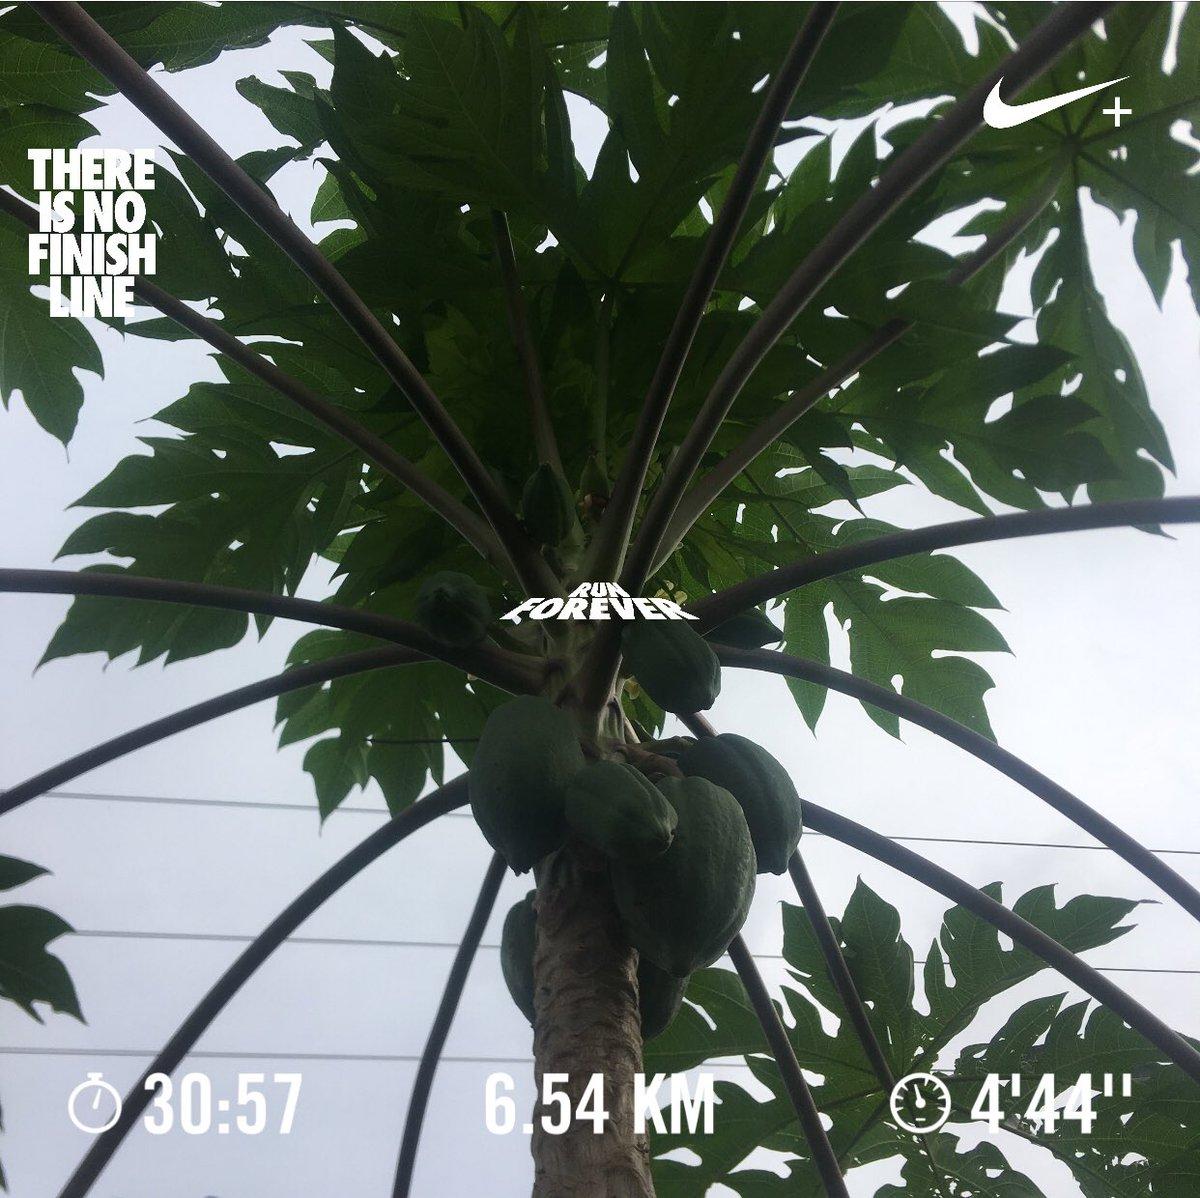 6..54km for the midweek #StayinCHRIST #StayFit #JustDoIt #nrc #nikerunning #nikerunclub #running #recoveryrun #recovery #iheartnike #halfmarathontraining, #Nike #iheartrunning @teamnike #runningismytherapy #runninglife @universeRunners @bennettrun @gtbahamas